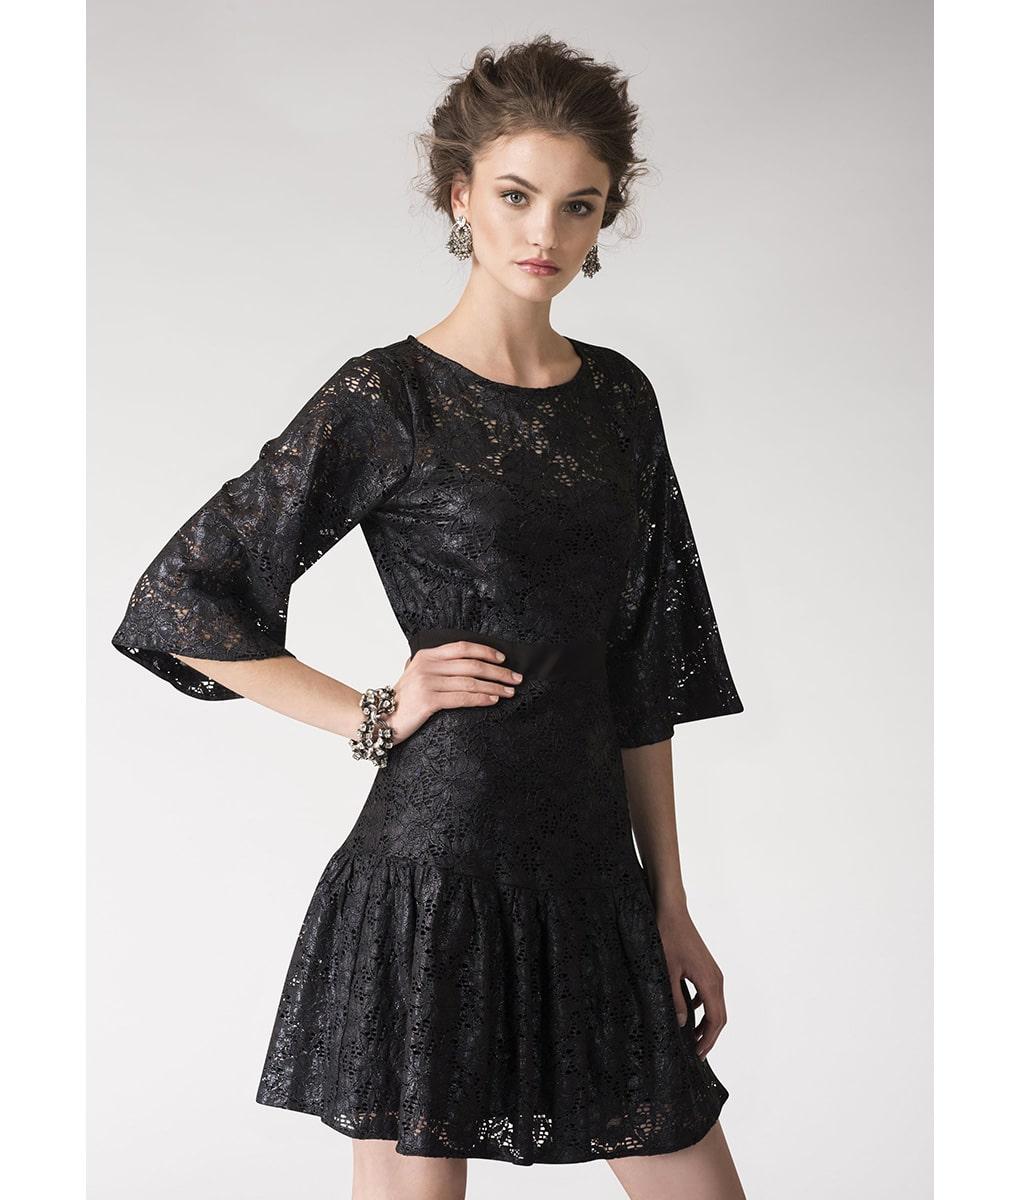 Alila-Metallic-Lace-Black-Party-Dress-Closet-London